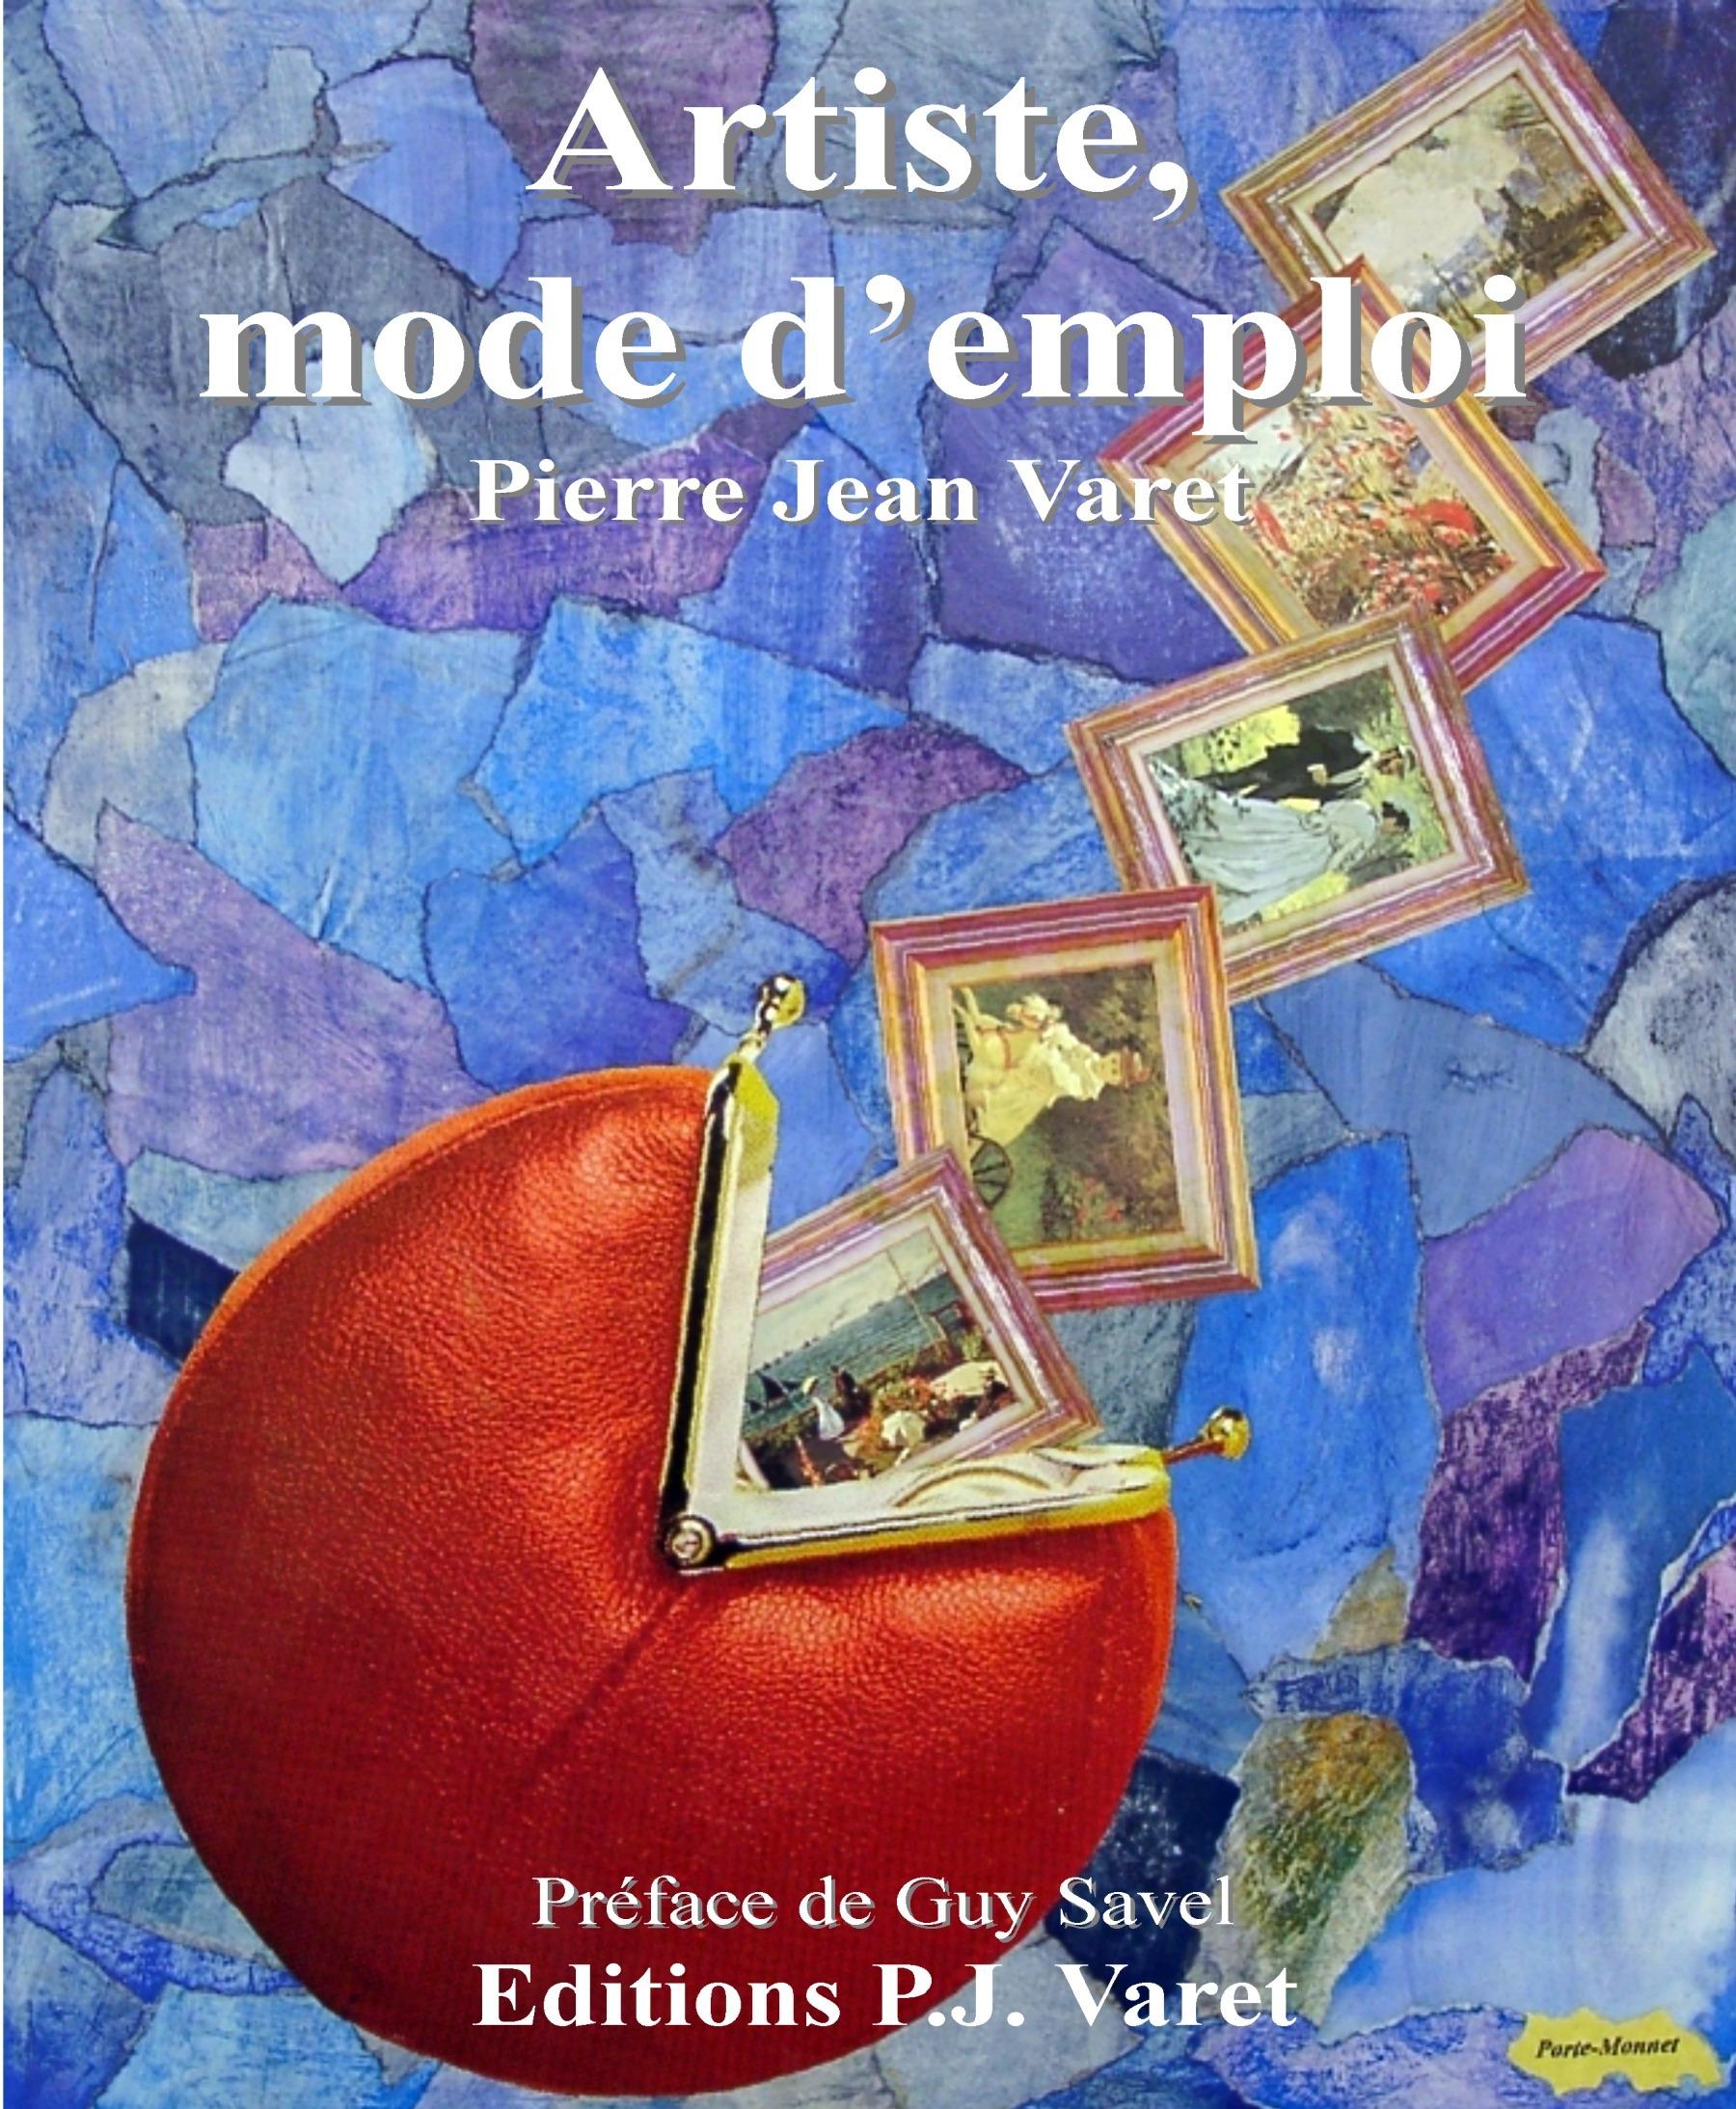 Pierre Jean Varet Artiste, mode d'emploi